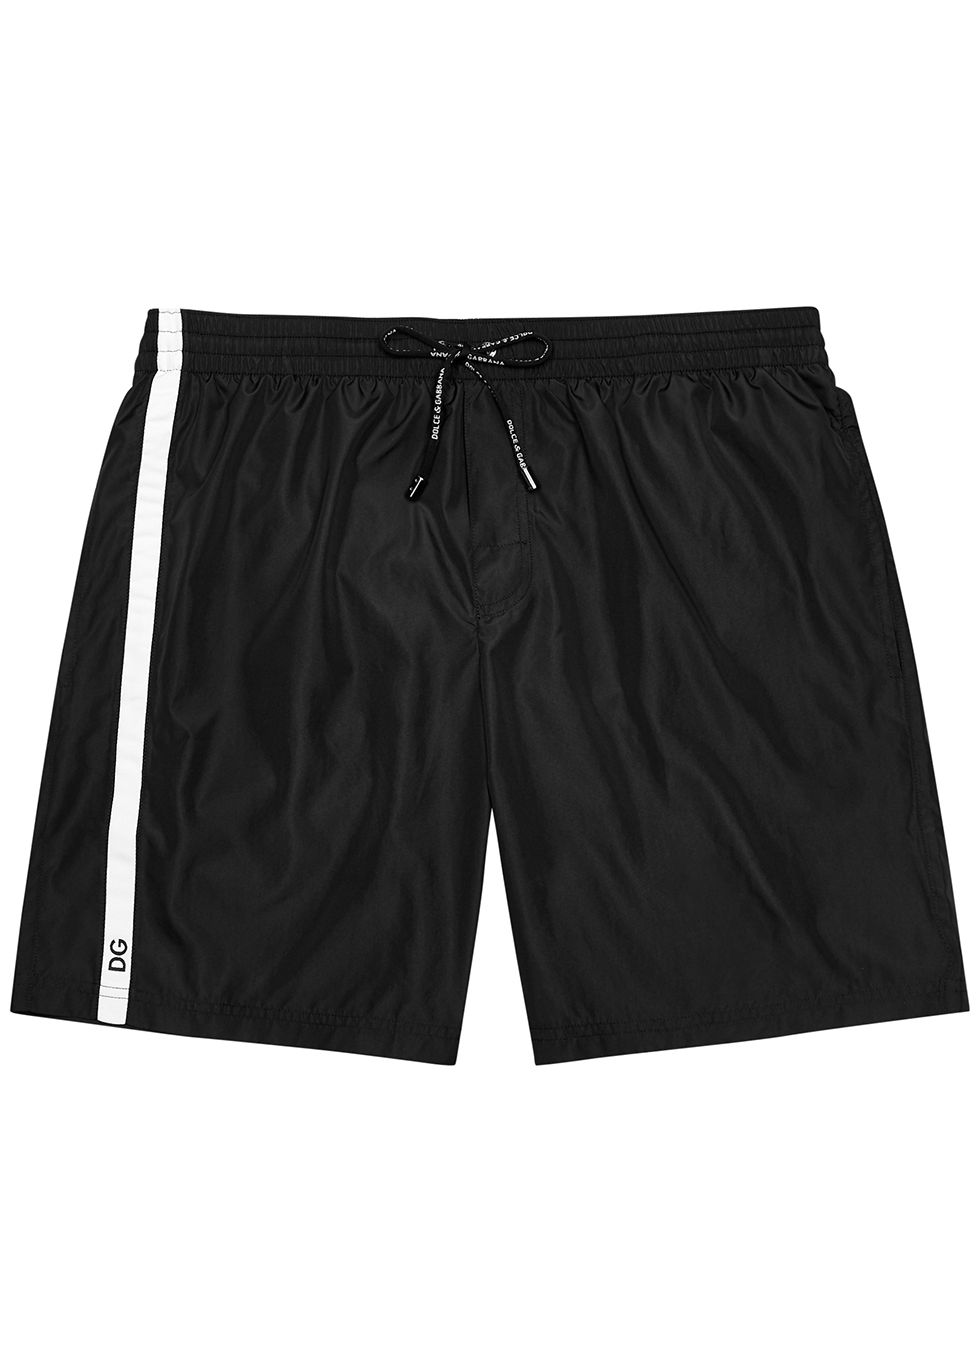 Black striped swim shorts